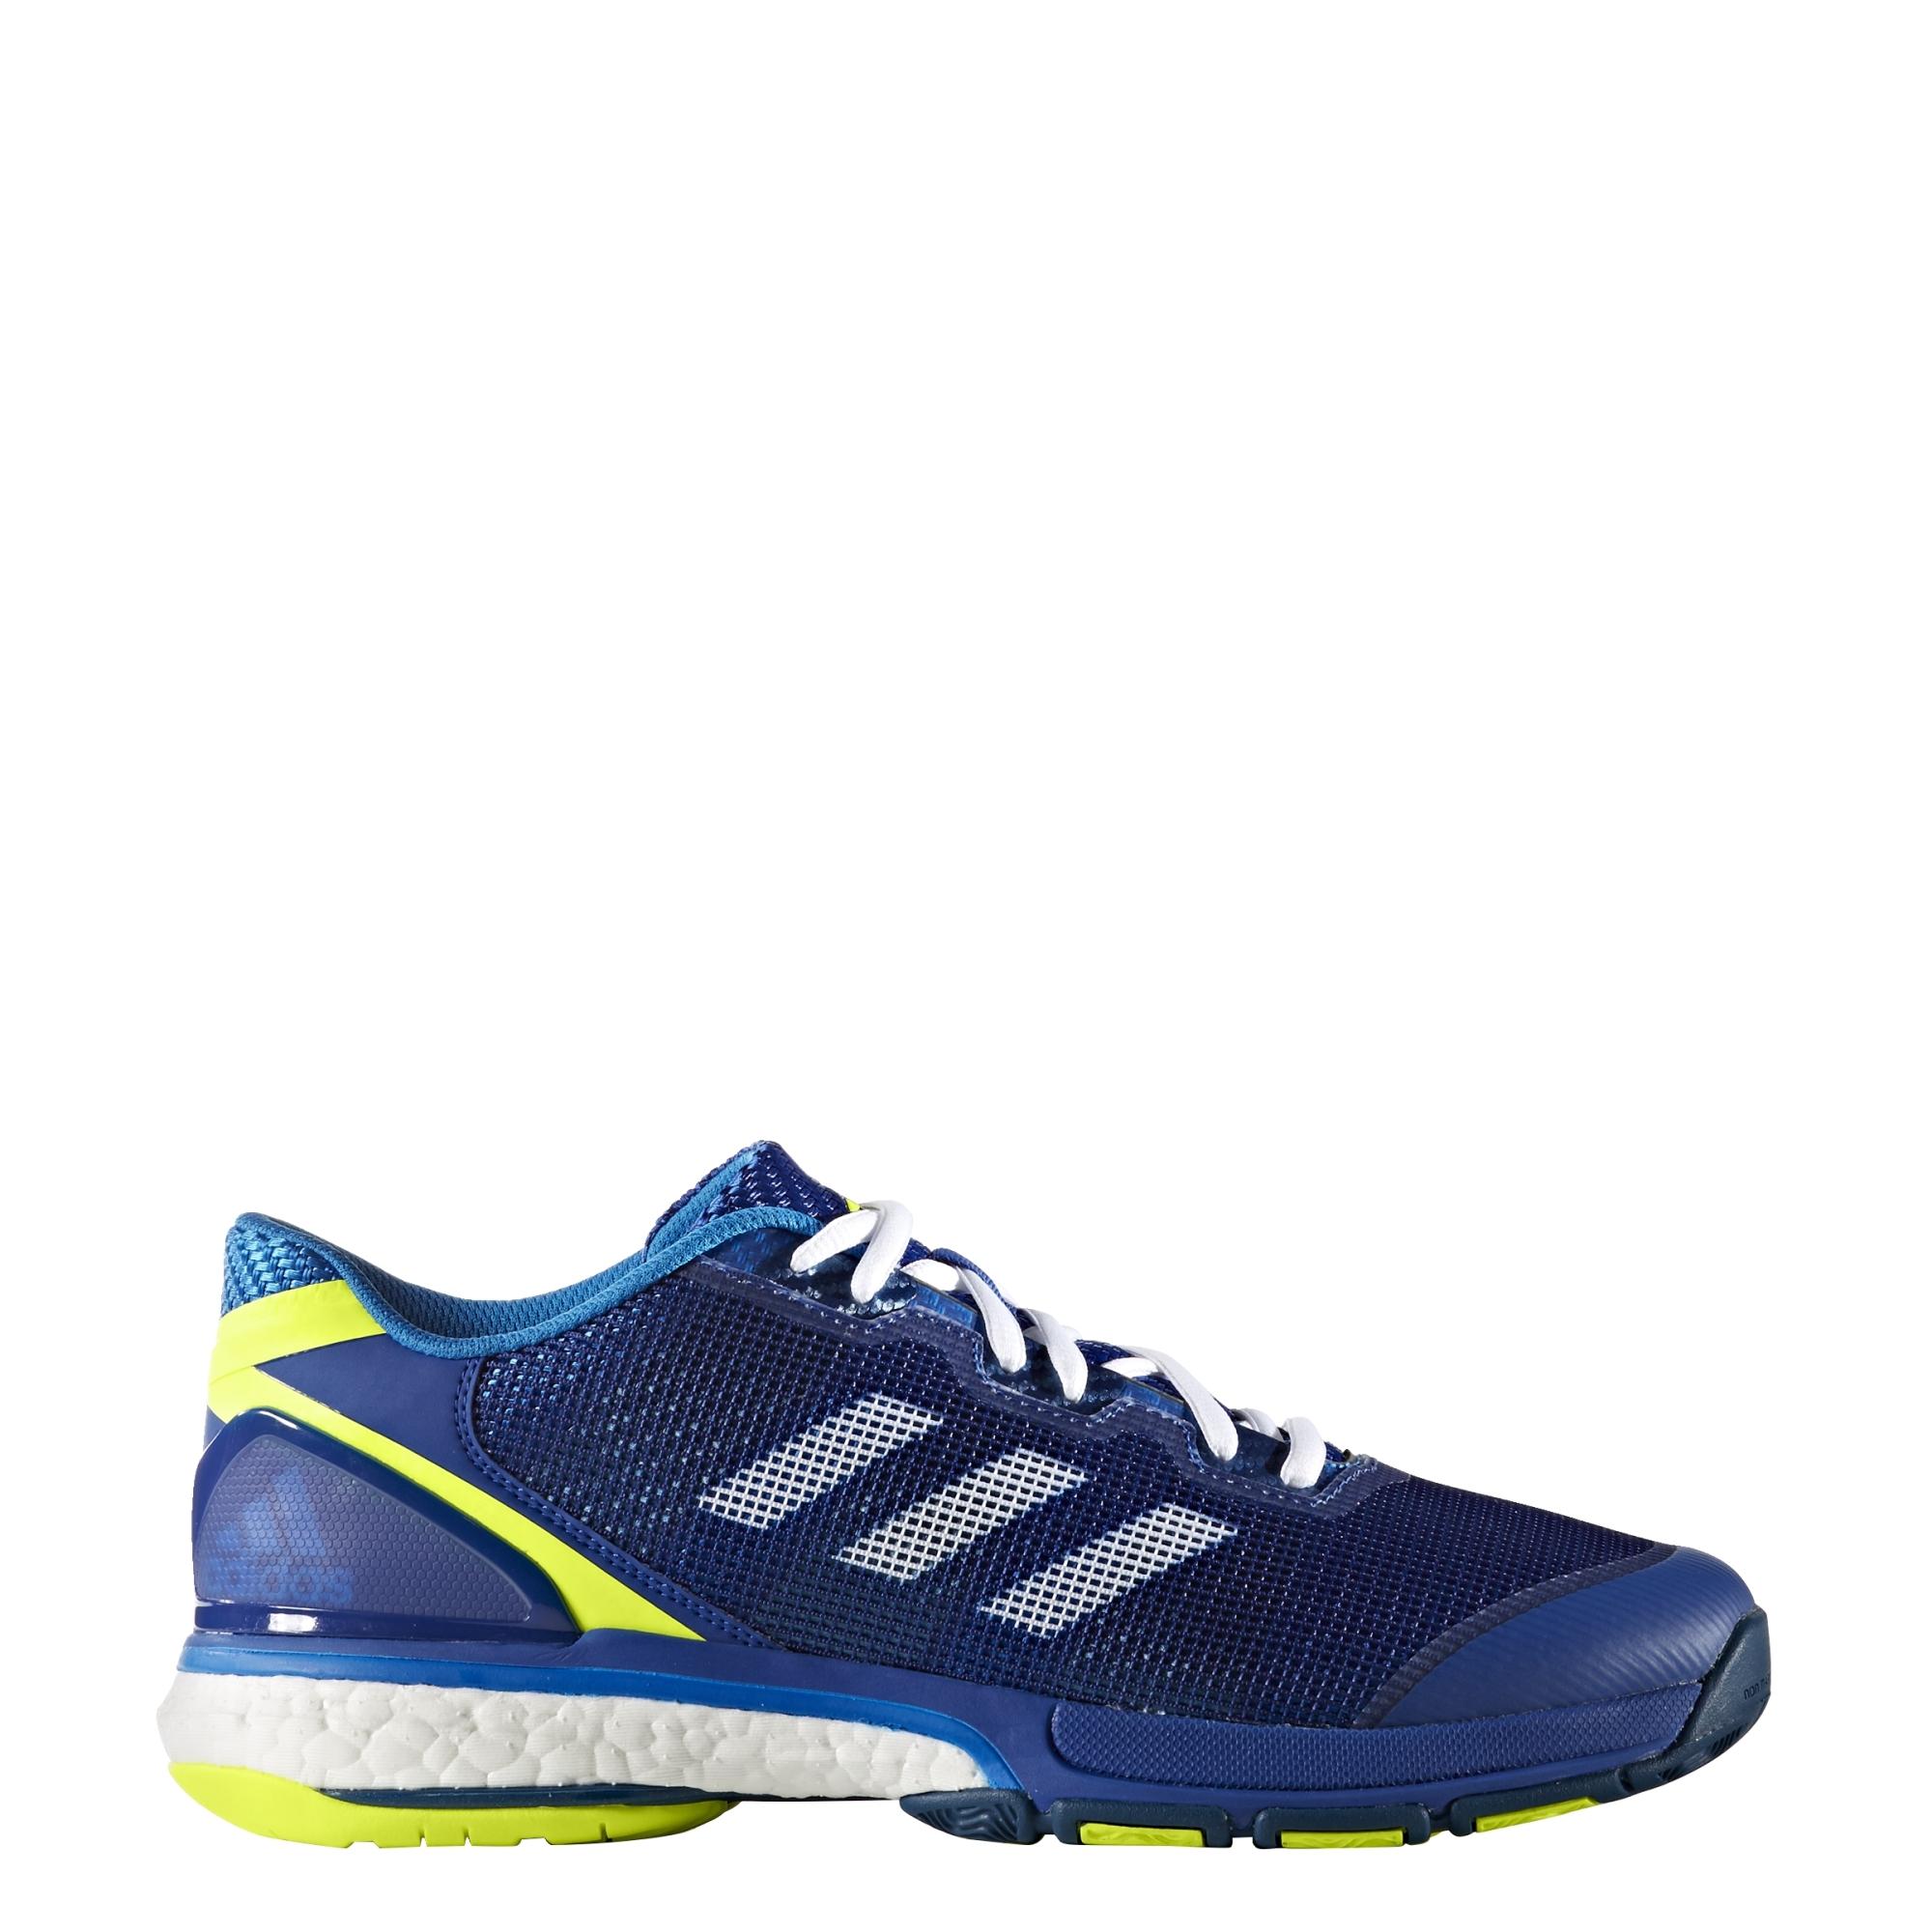 18db531f139b9 Buty adidas Stabil Boost 2.0 Shoes BA8345 %SALE% - 7015353085 ...